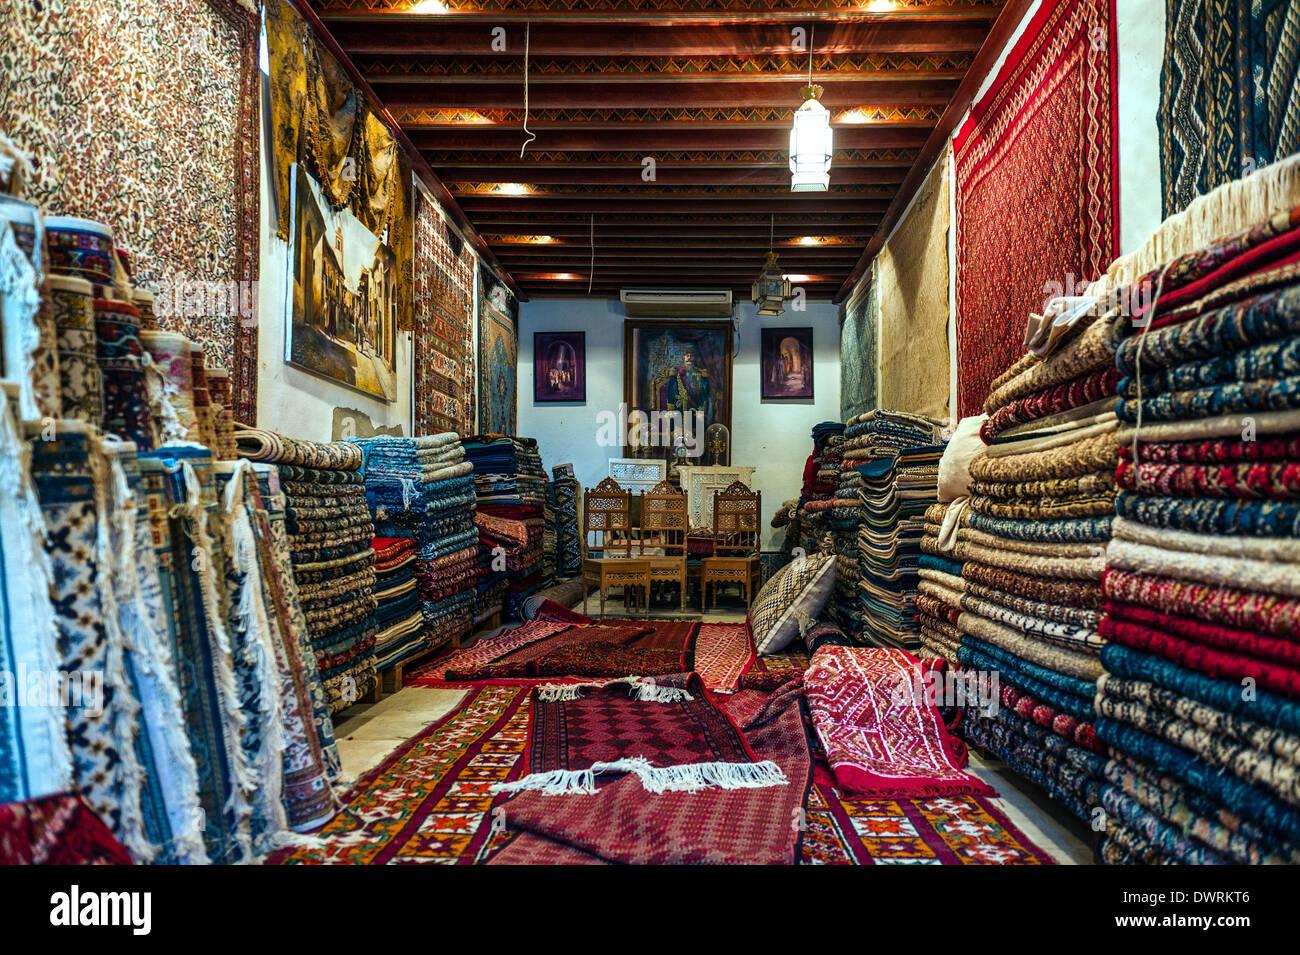 North Africa, Tunisia, Tunis. Carpets shop. - Stock Image